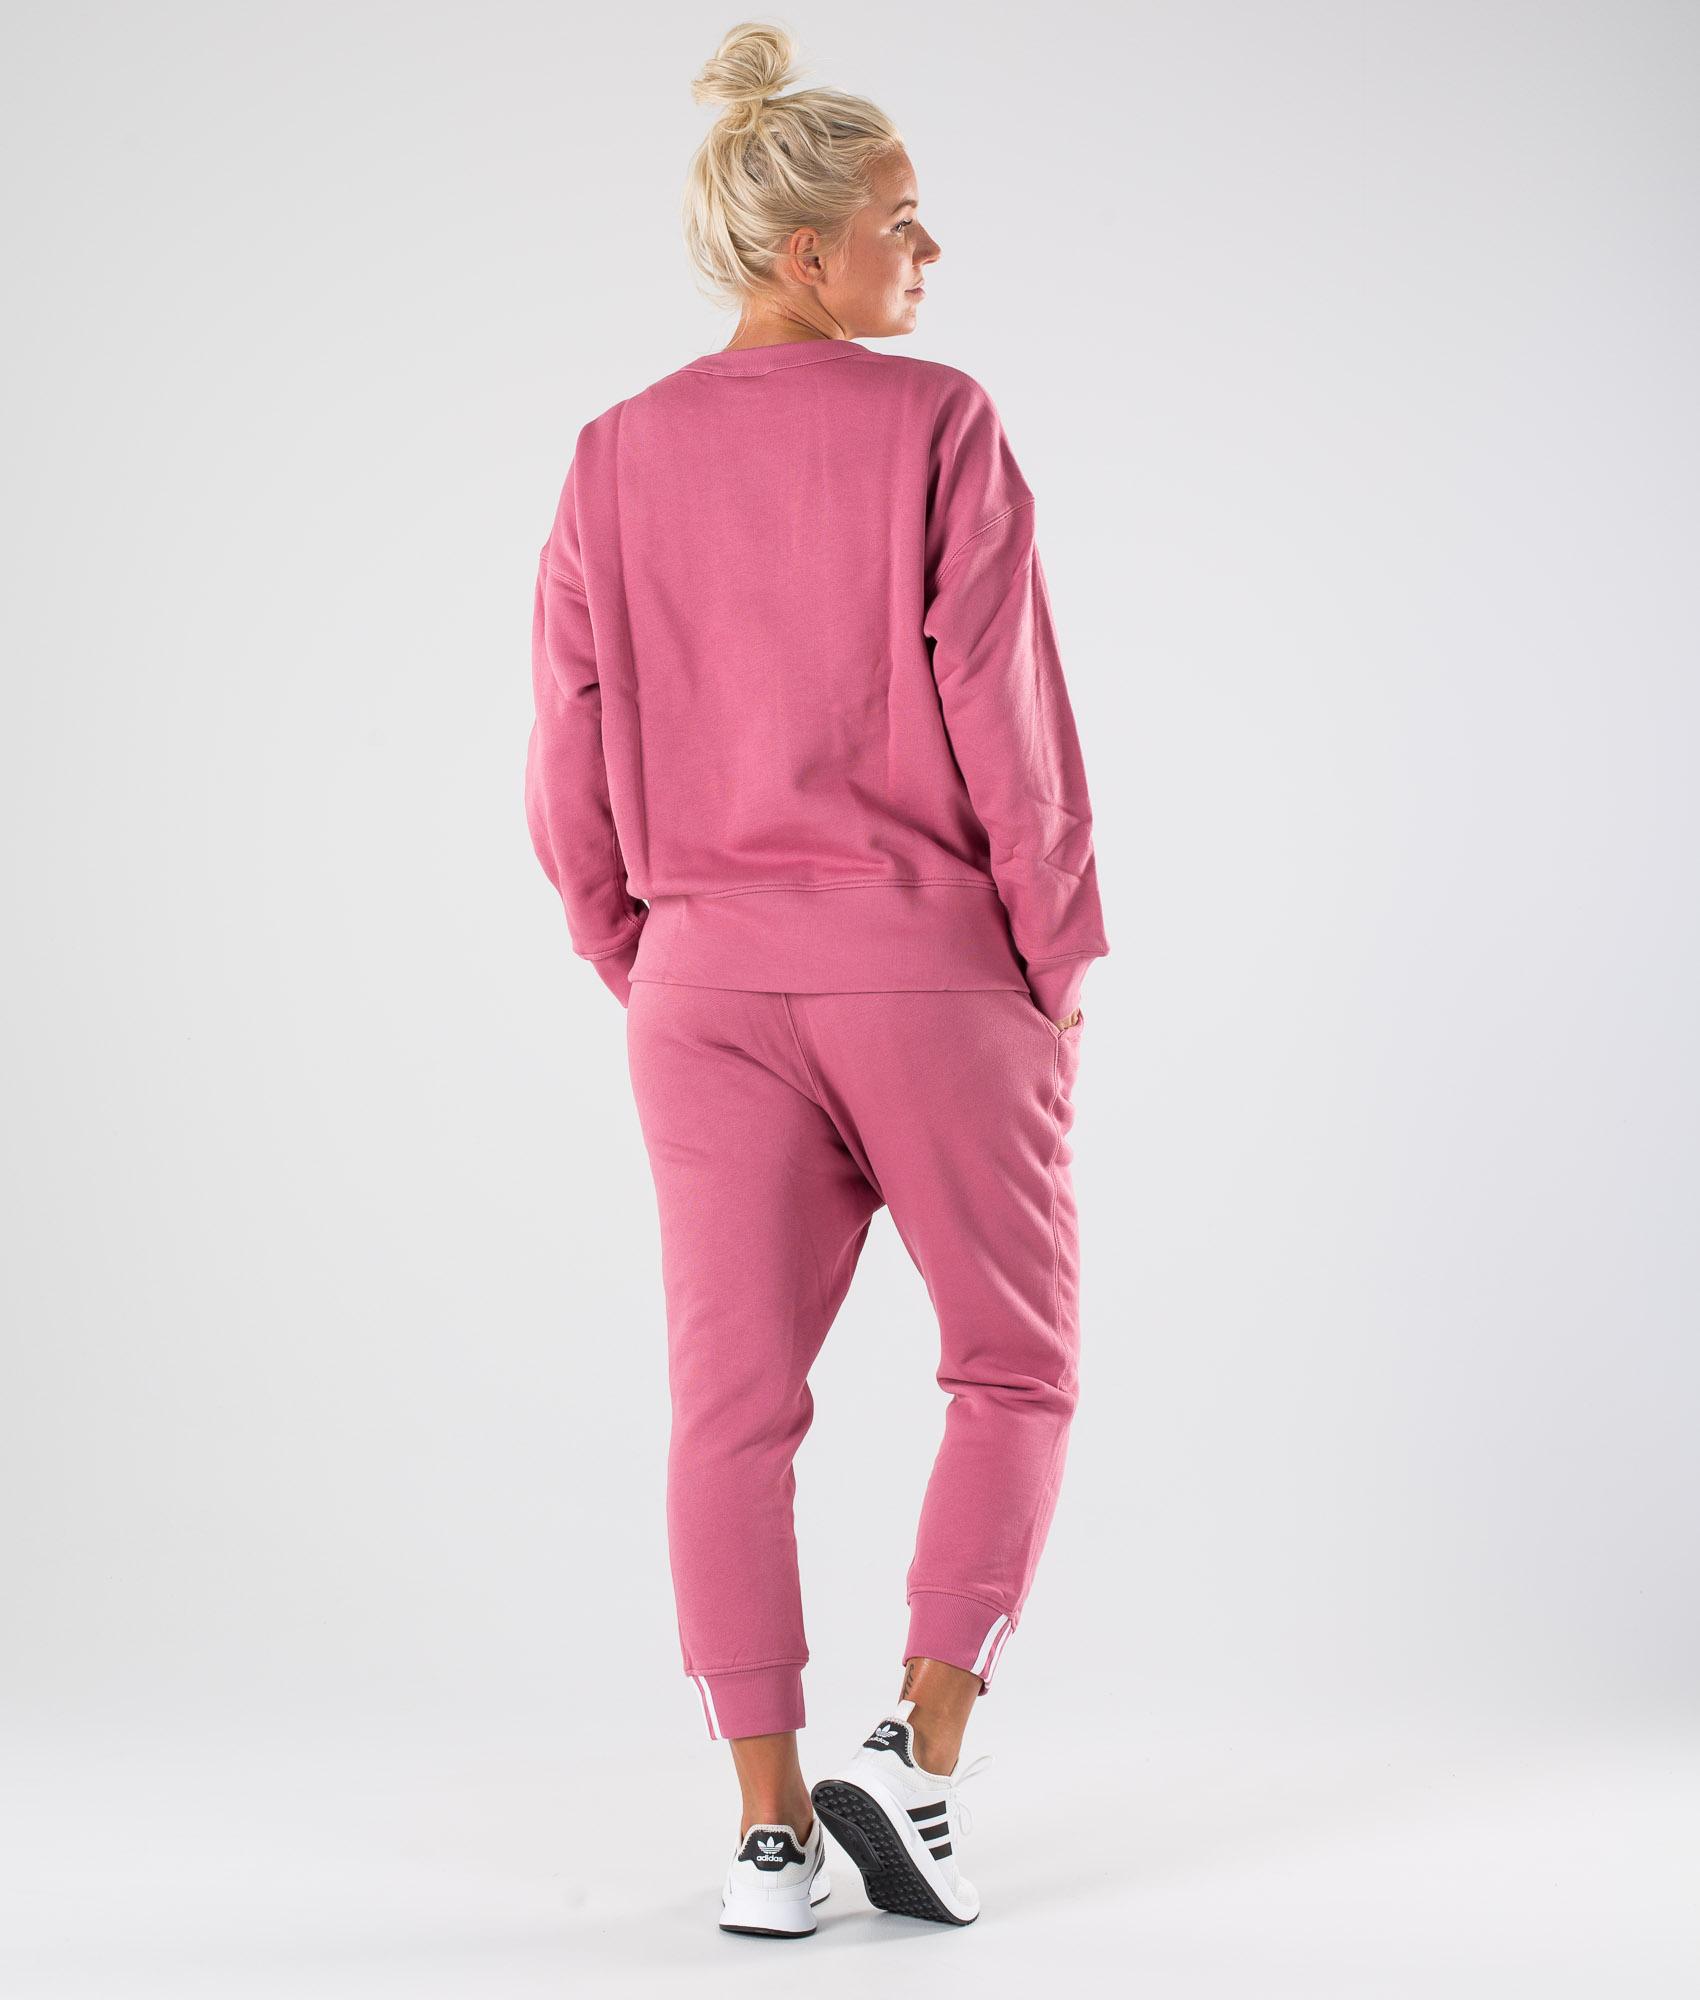 Adidas Originals Vocal Sweatshirt Gensere Trace Maroon